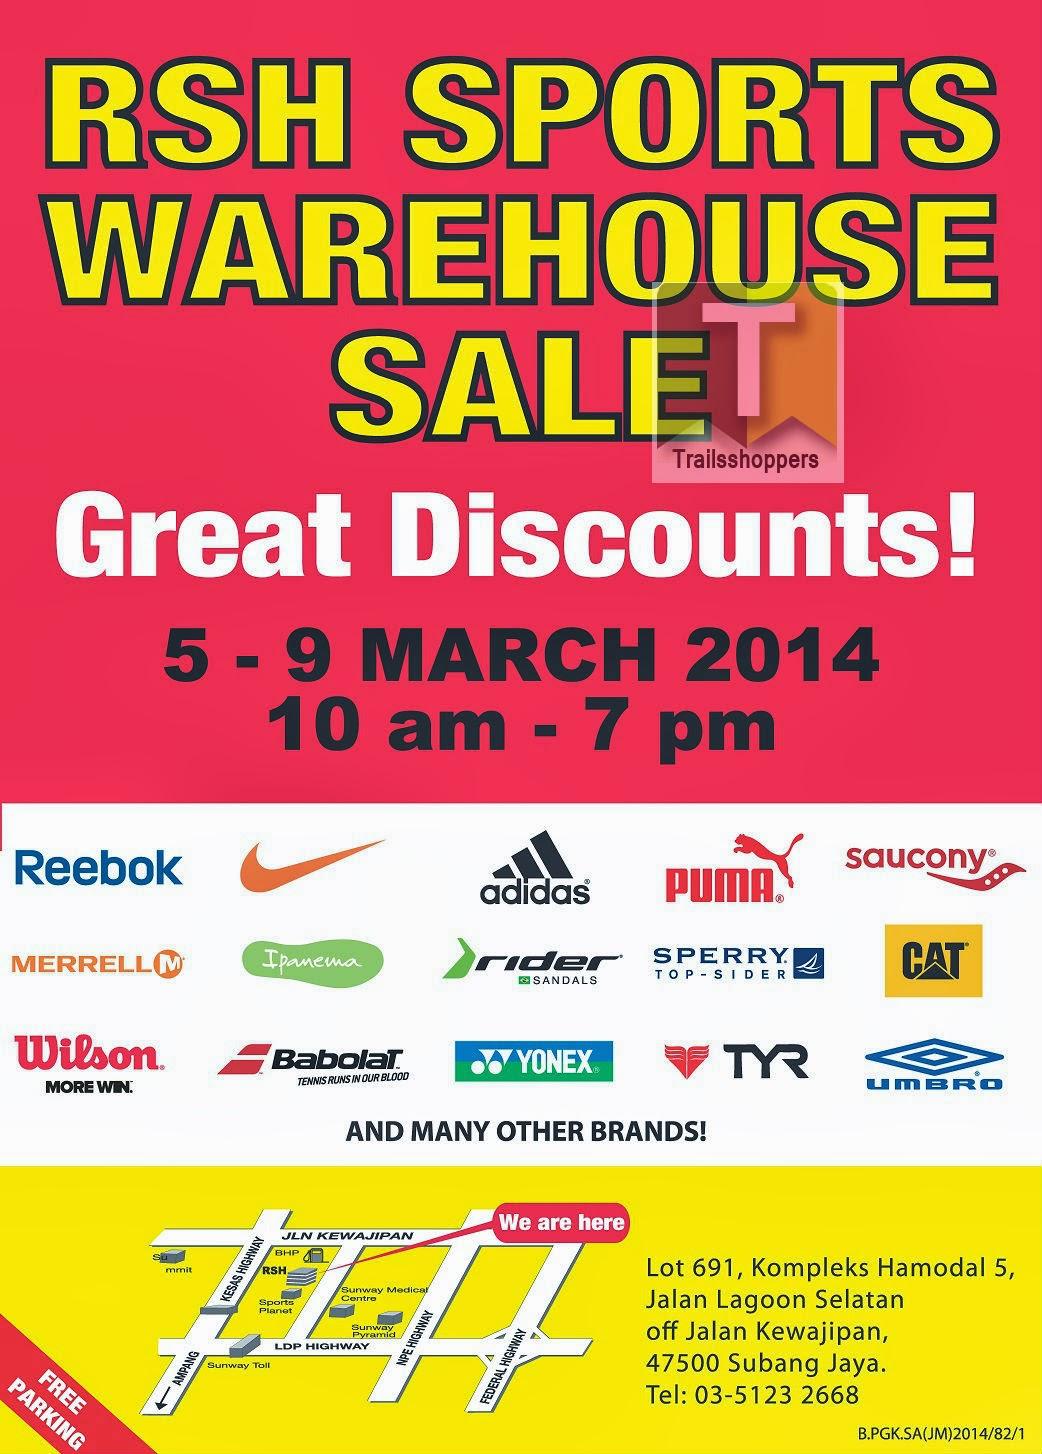 RSH Sports Warehouse Sale Selangor Sunway Pyramid University